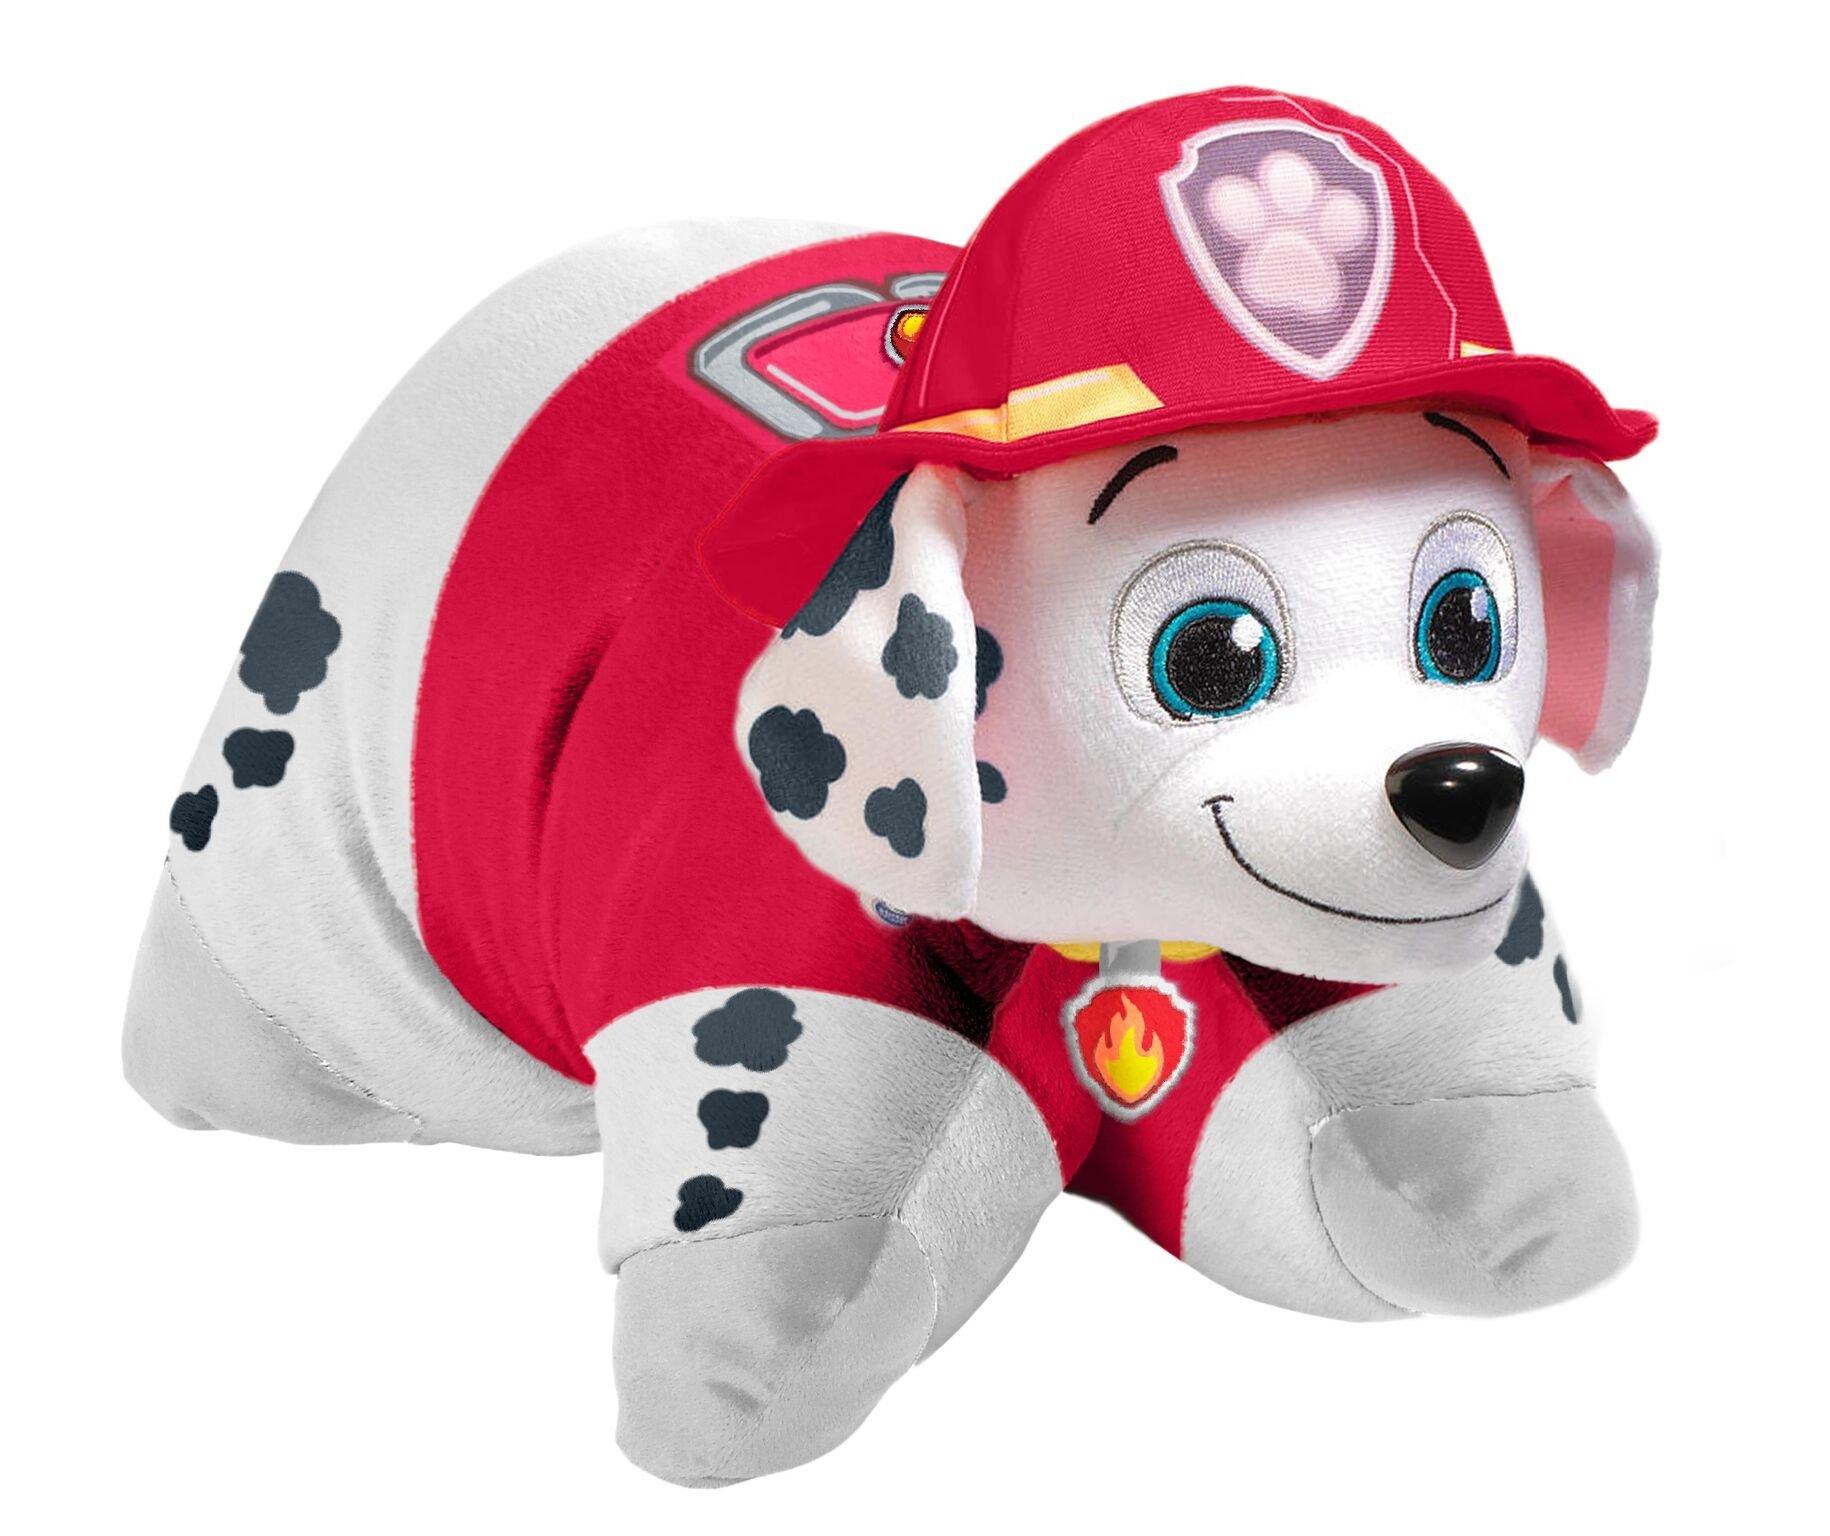 Pillow Pets Nickelodeon Paw Patrol, Marshall Dalmatian, 16'' Stuffed Animal Plush Toy by Pillow Pets